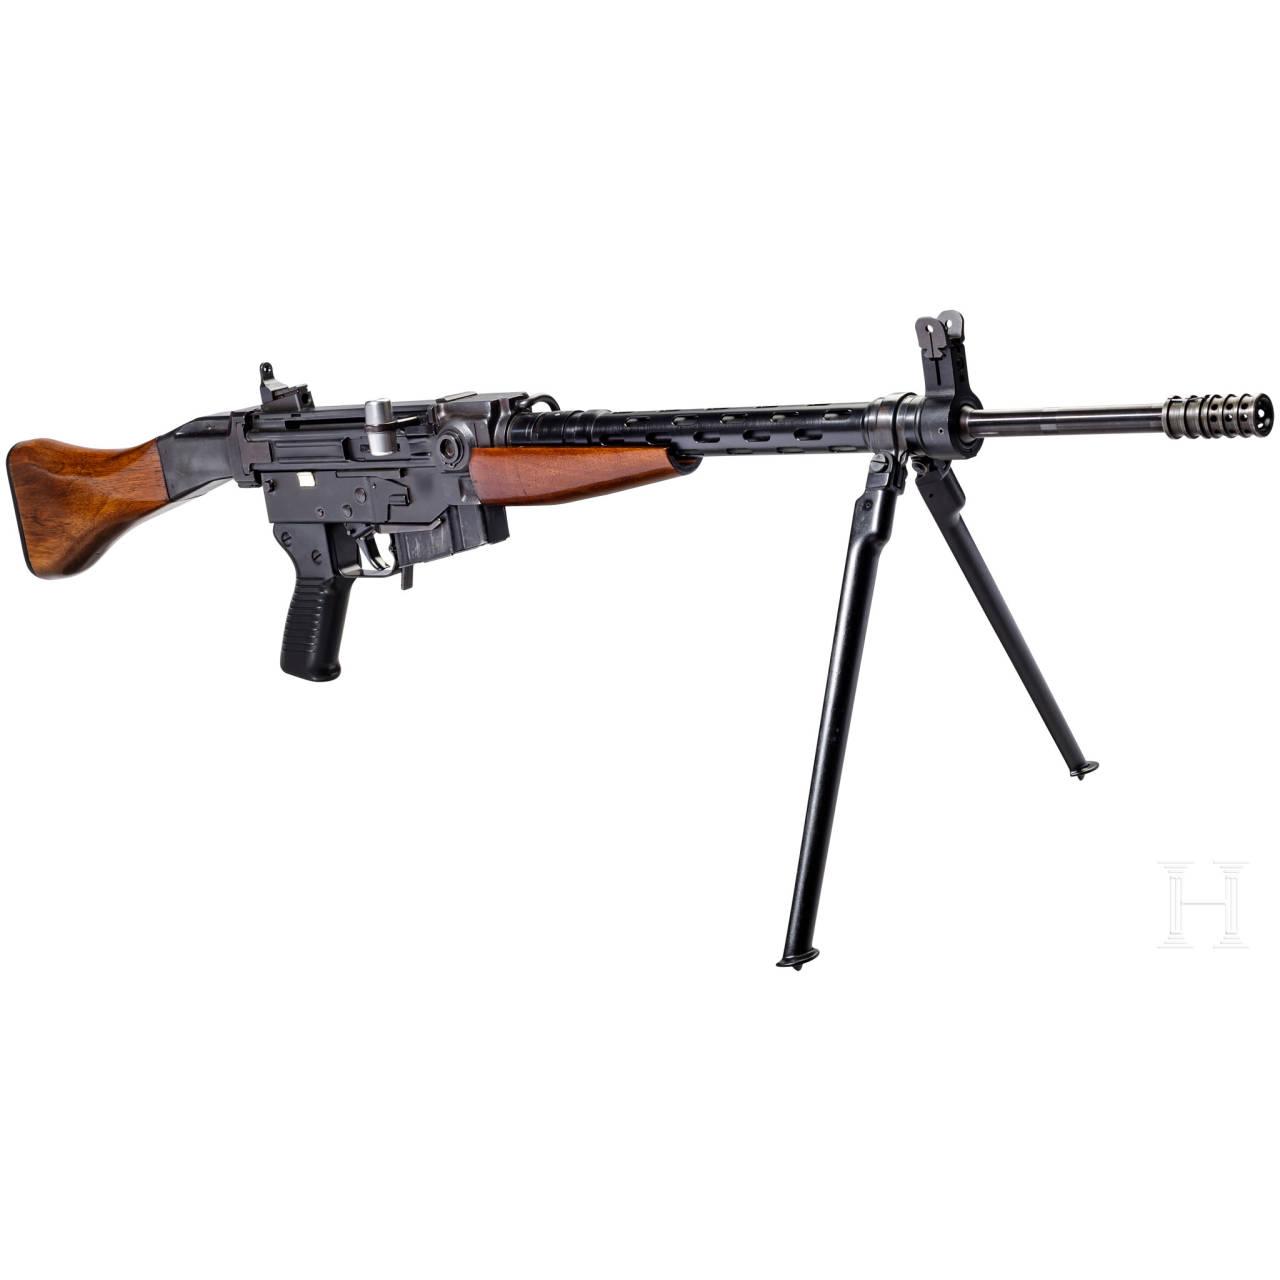 A self-loading rifle SIG-AMT